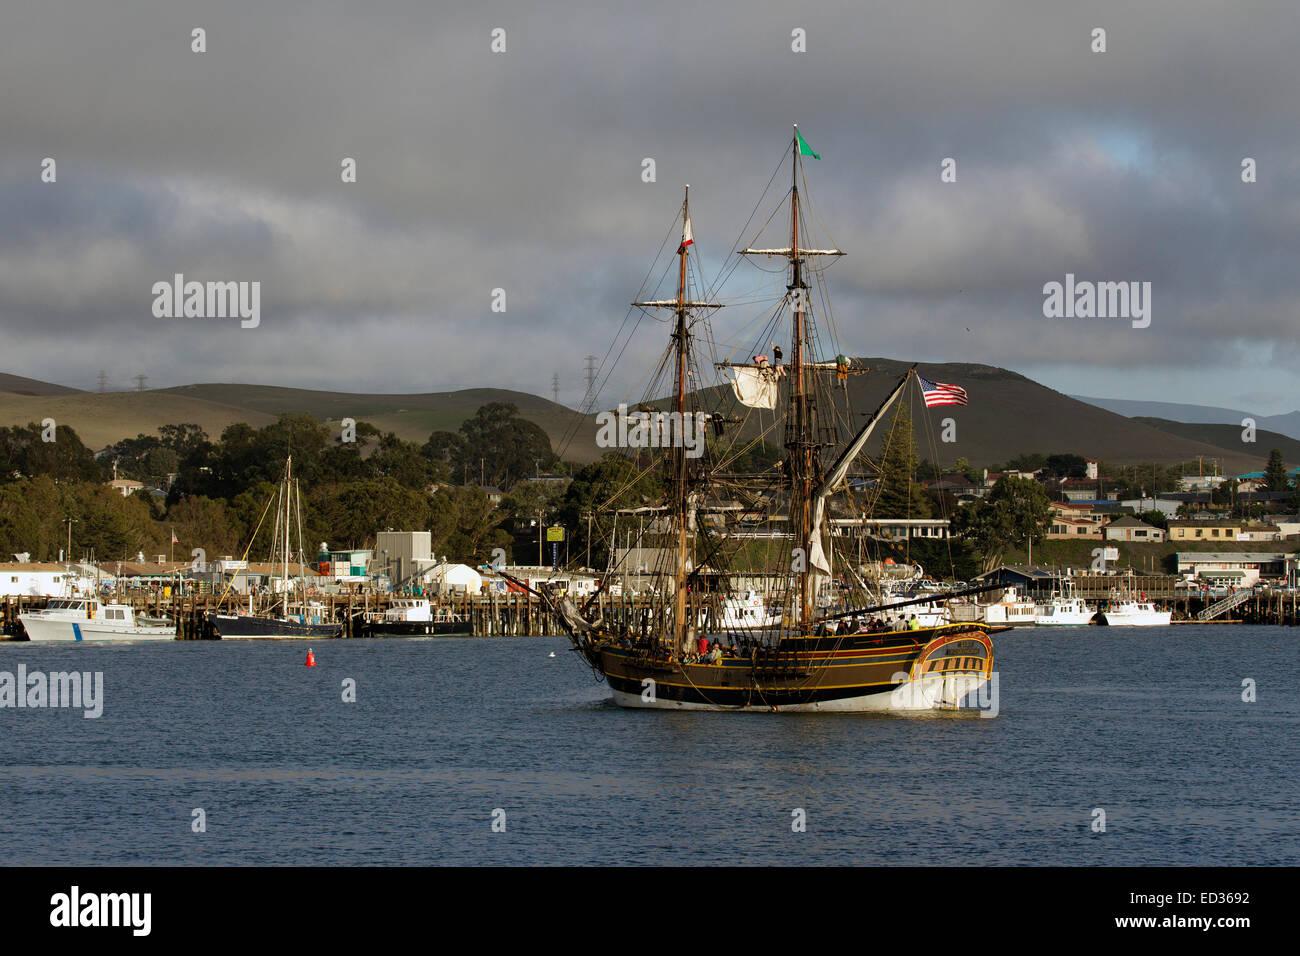 Lady Washington historische Schiff Replik in Morro Bay, Kalifornien Stockfoto